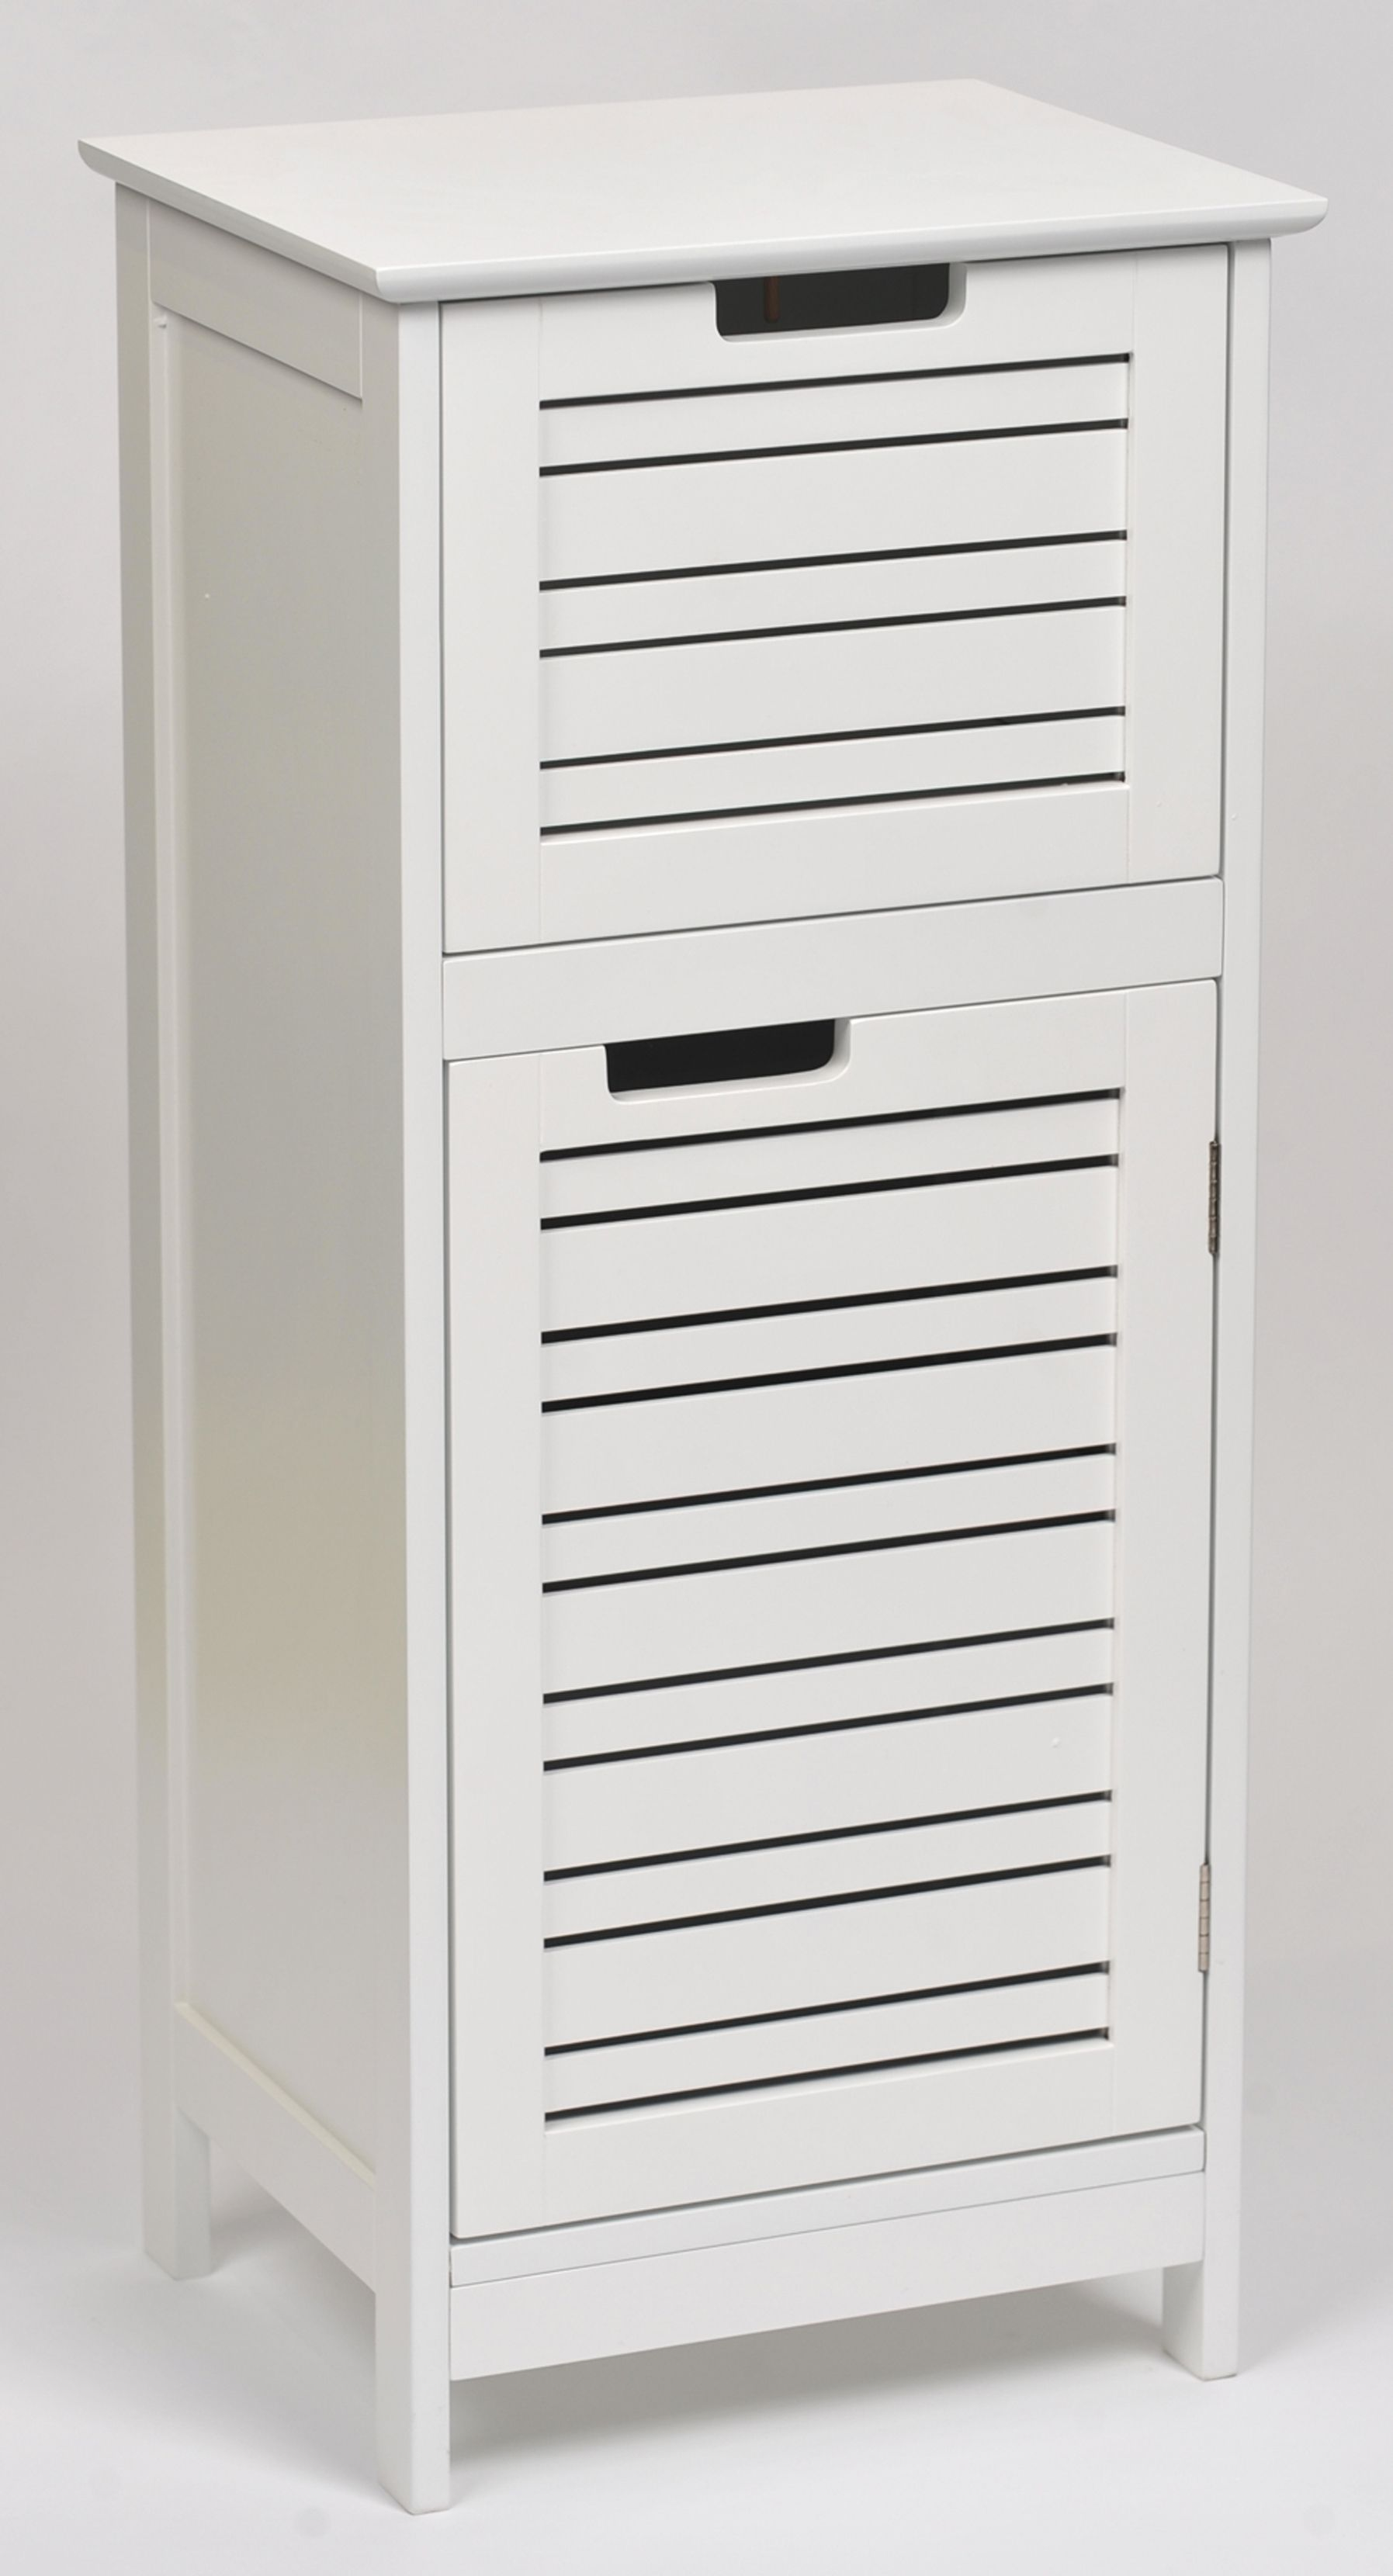 Bathroom Floor Cabinet Bathroom Storage Bathroom Floor Cabinets Free Standing Cabinets